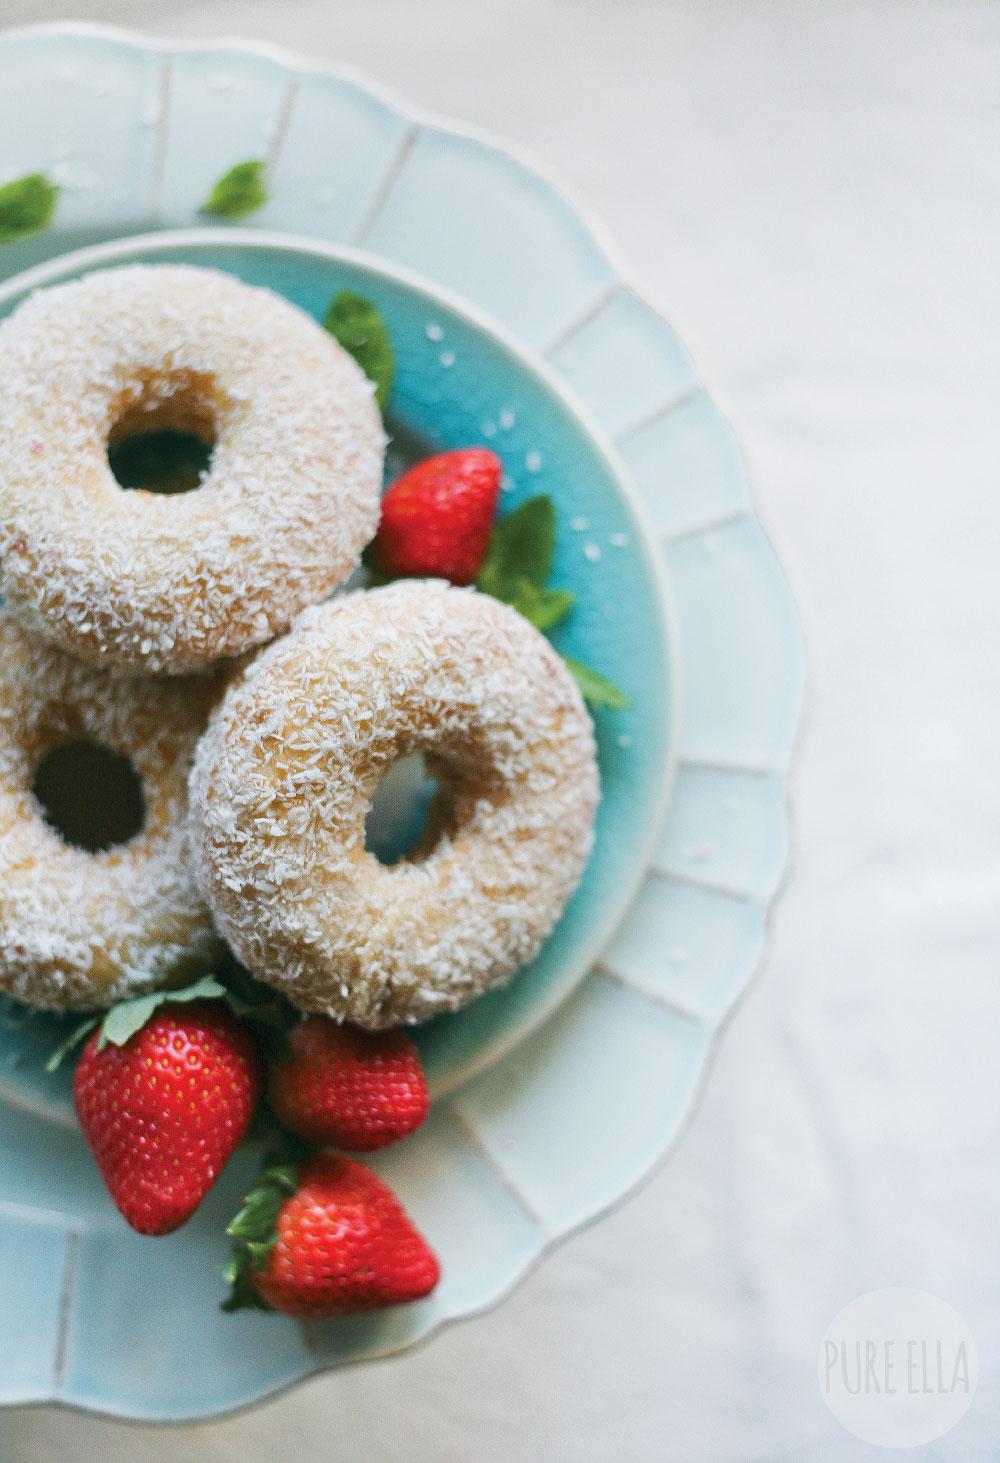 Pure-Ella-gluten-free-vegan-coconut-vanilla-donuts-so-delicious5